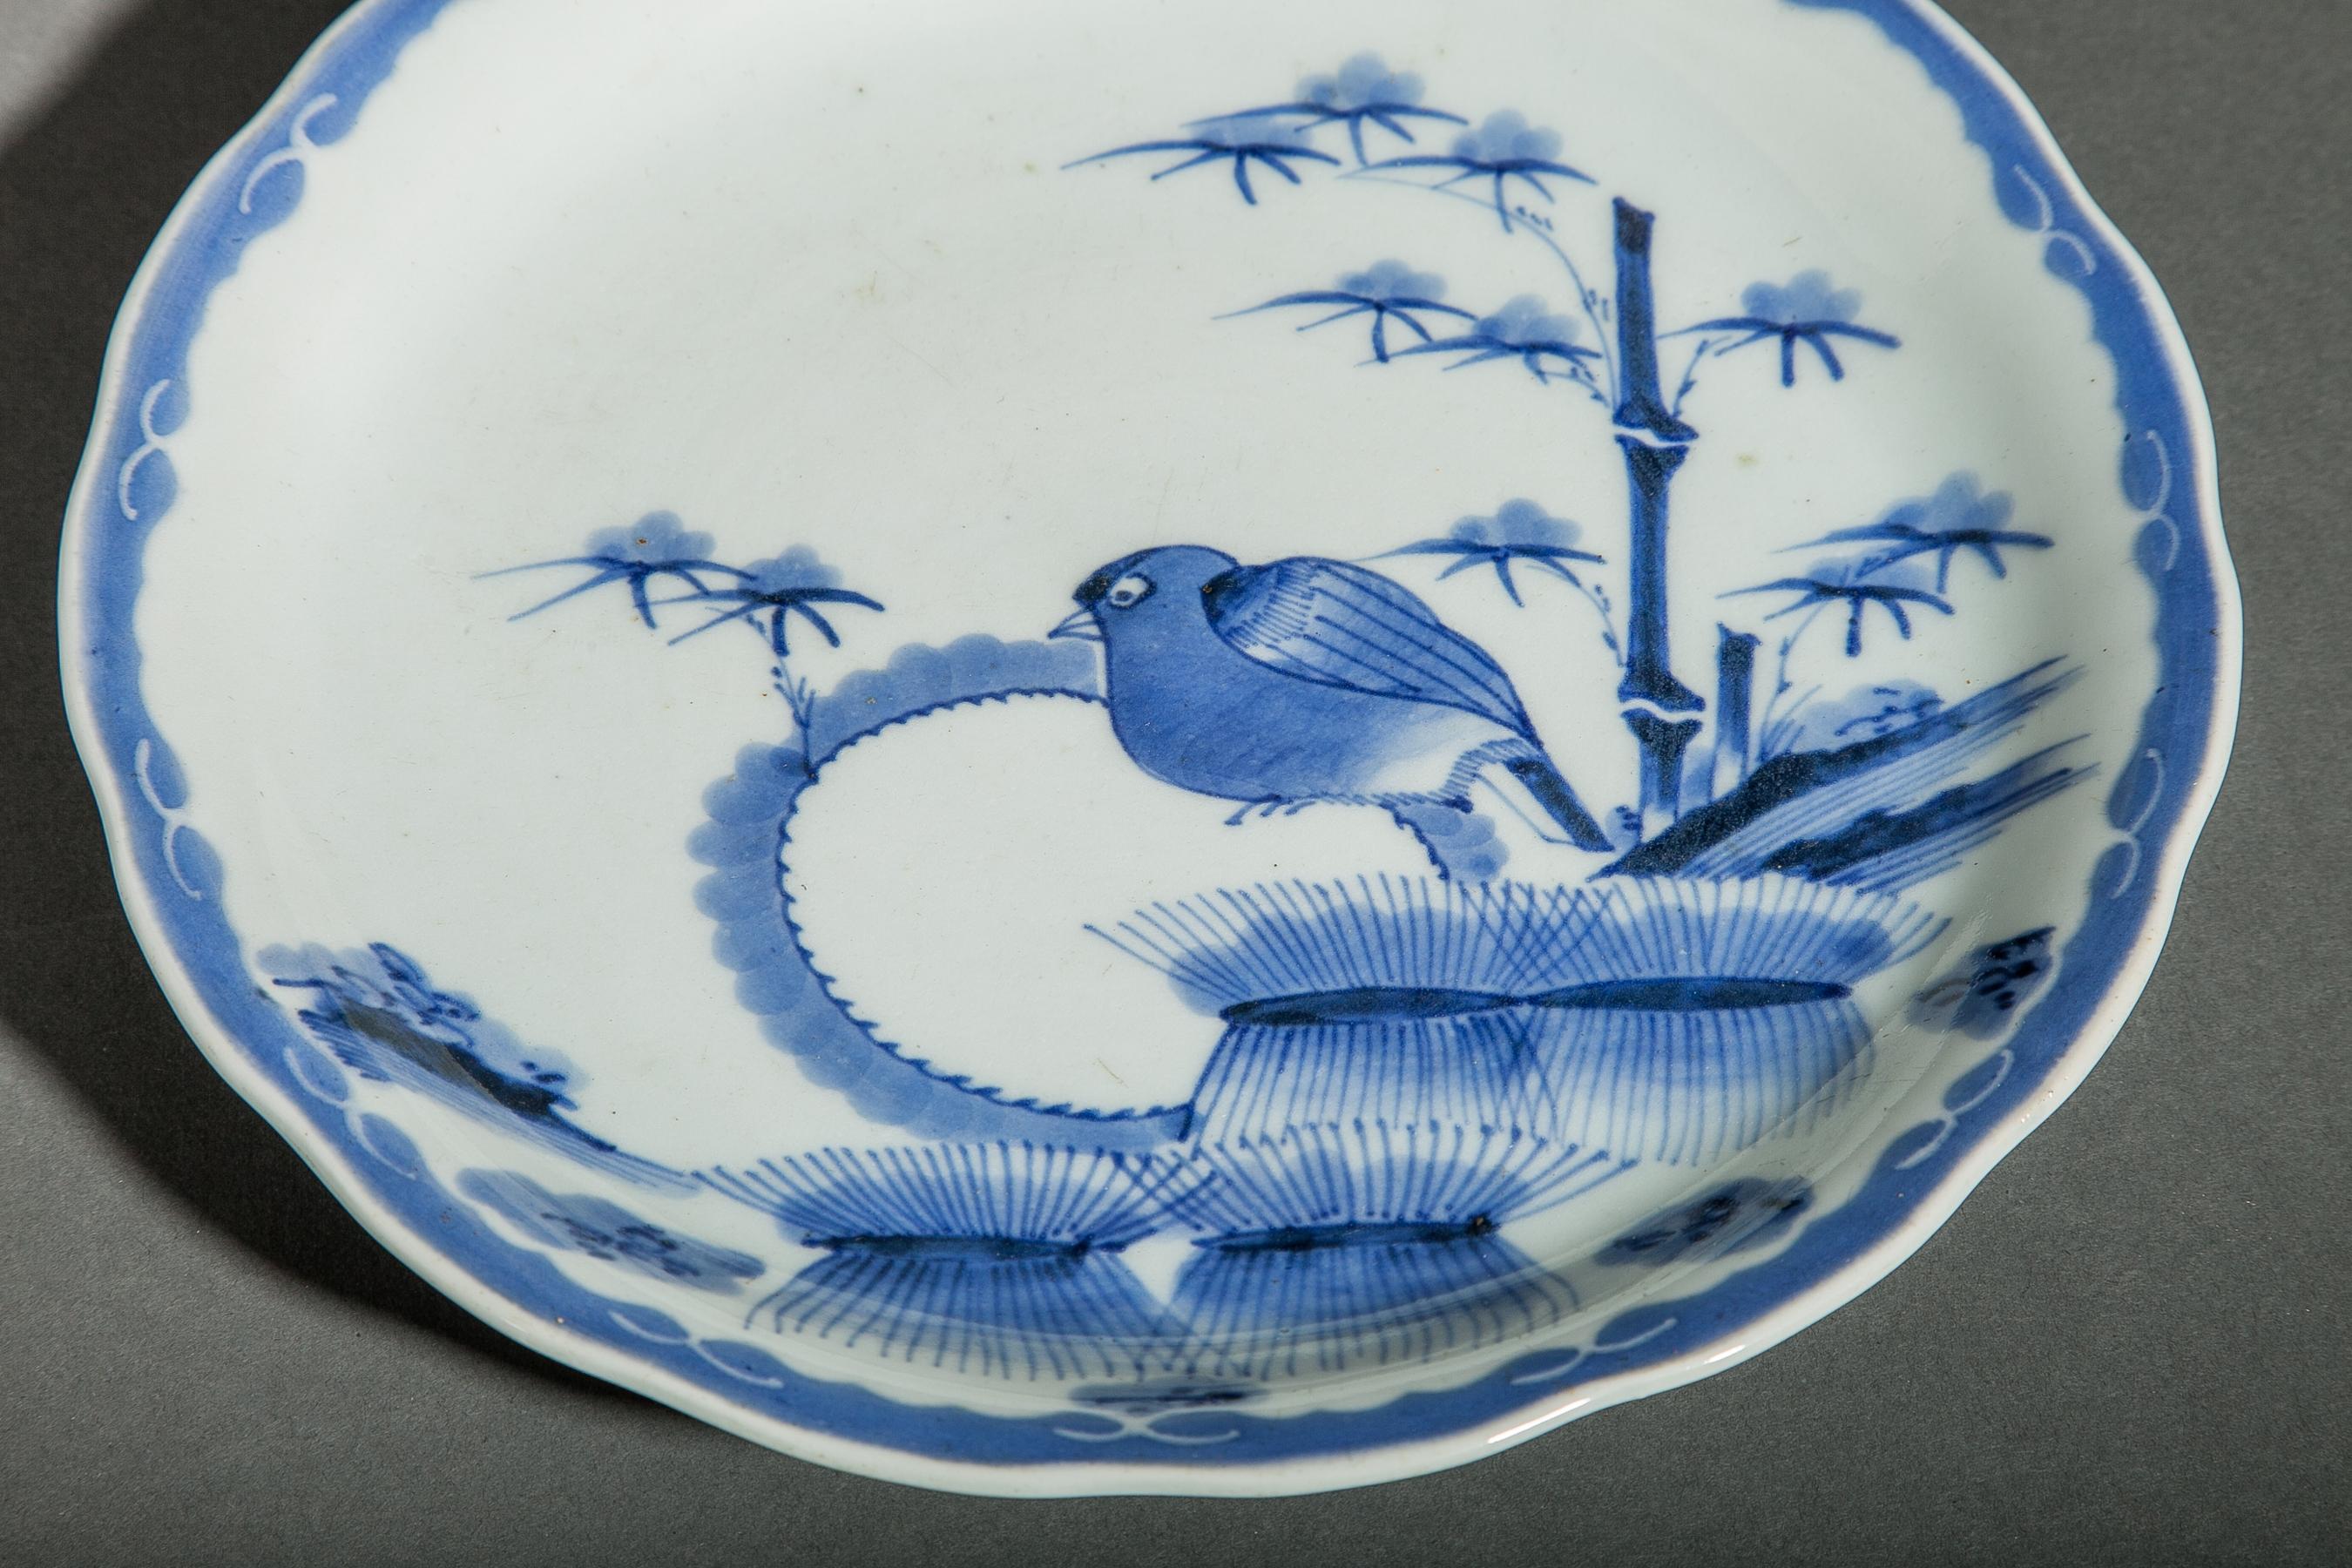 Japanese Blue and White Lobed Imari Plate